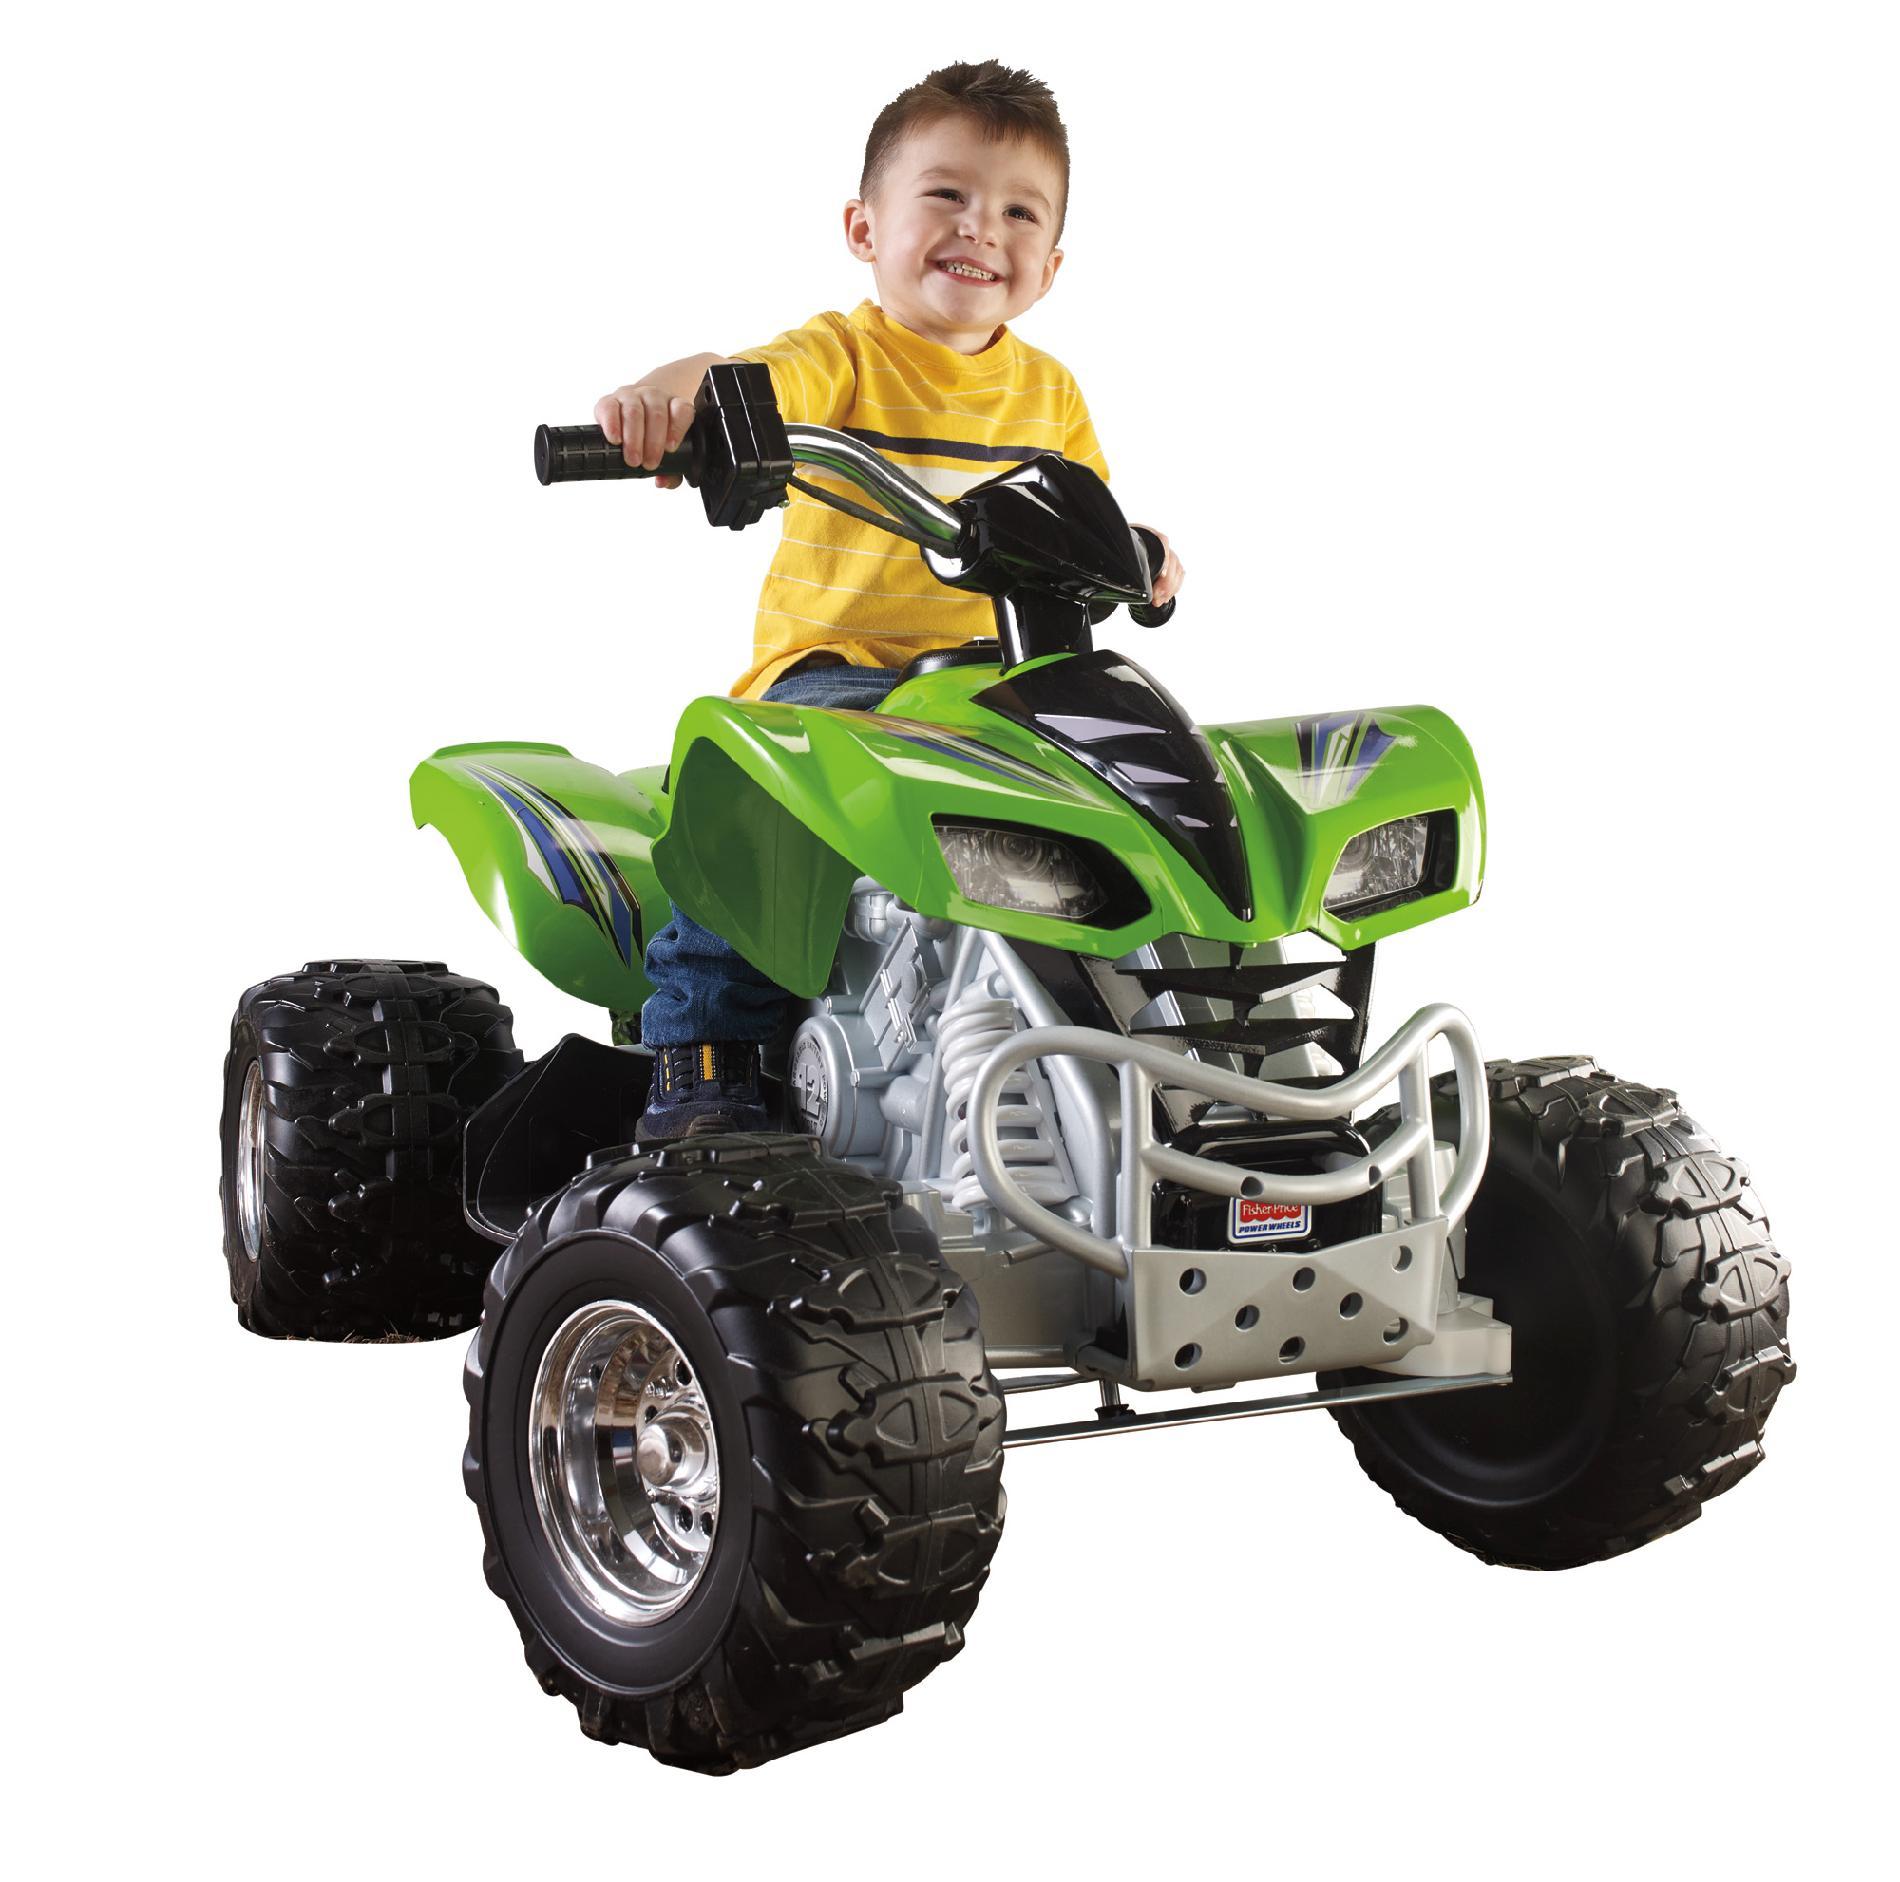 Power Wheels 12v Battery Toy Ride- - Kawaskai Kfx Green